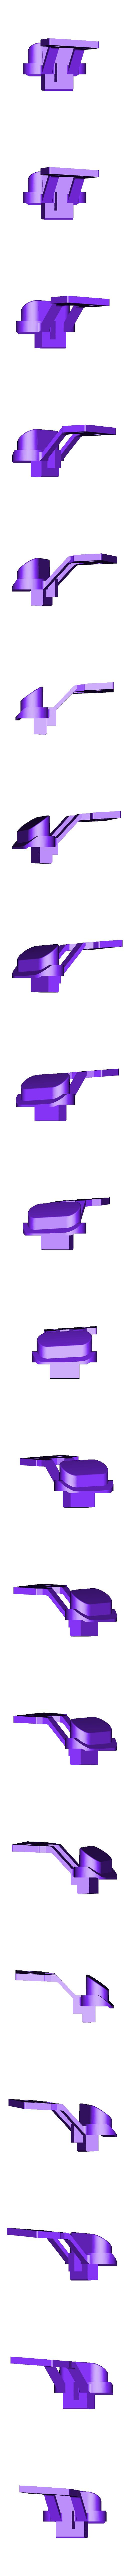 Power_Button.stl Download free STL file Oculus Rift DK2 • 3D printing object, indigo4